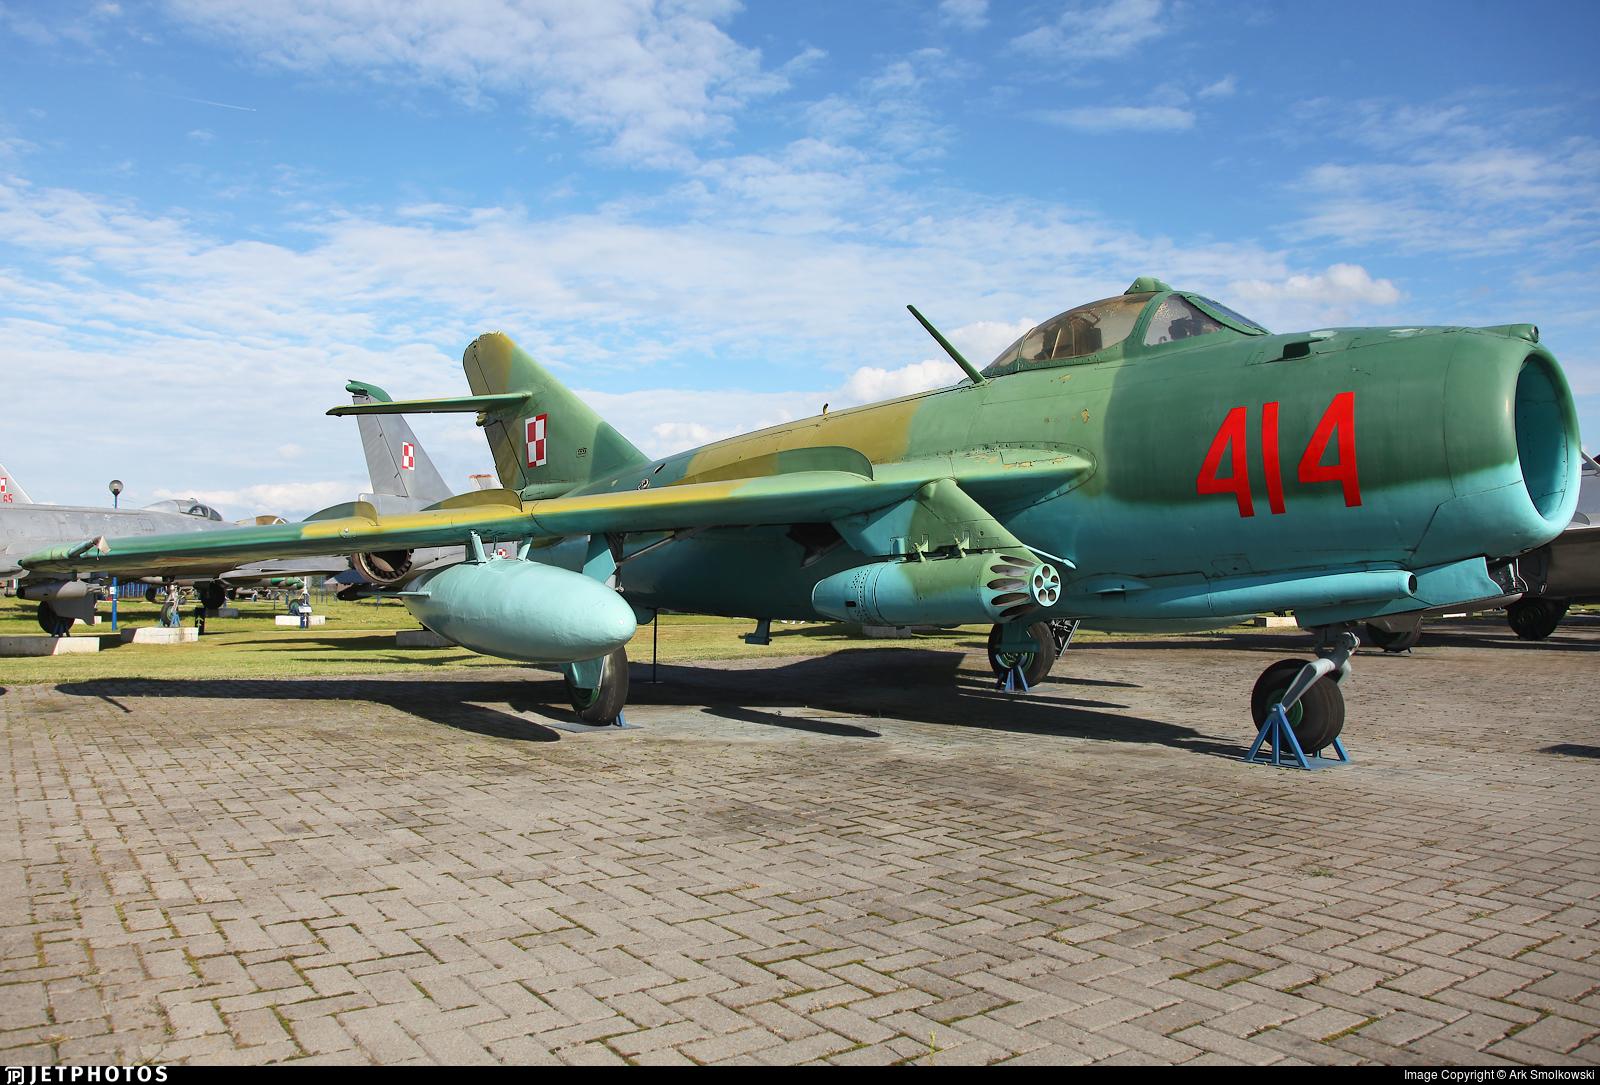 414 - Mikoyan-Gurevich MiG-15bis Fagot - Poland - Air Force